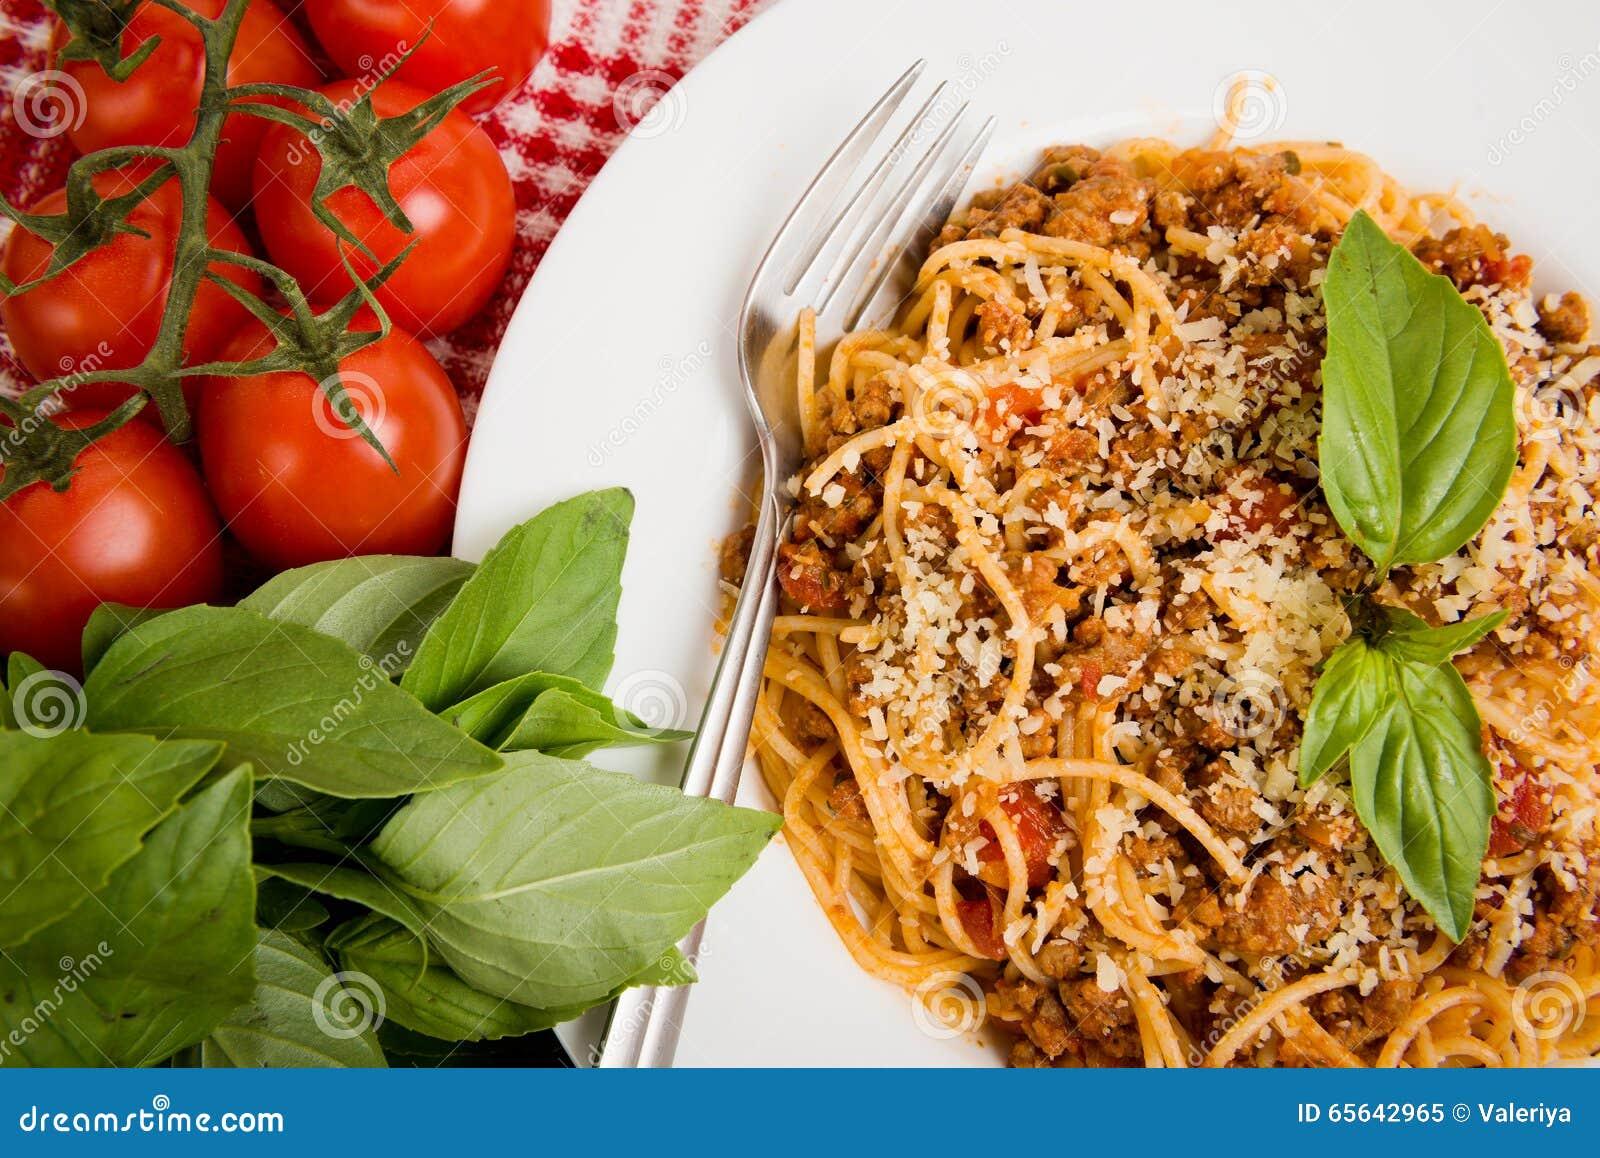 Pâtes avec de la viande, sauce tomate